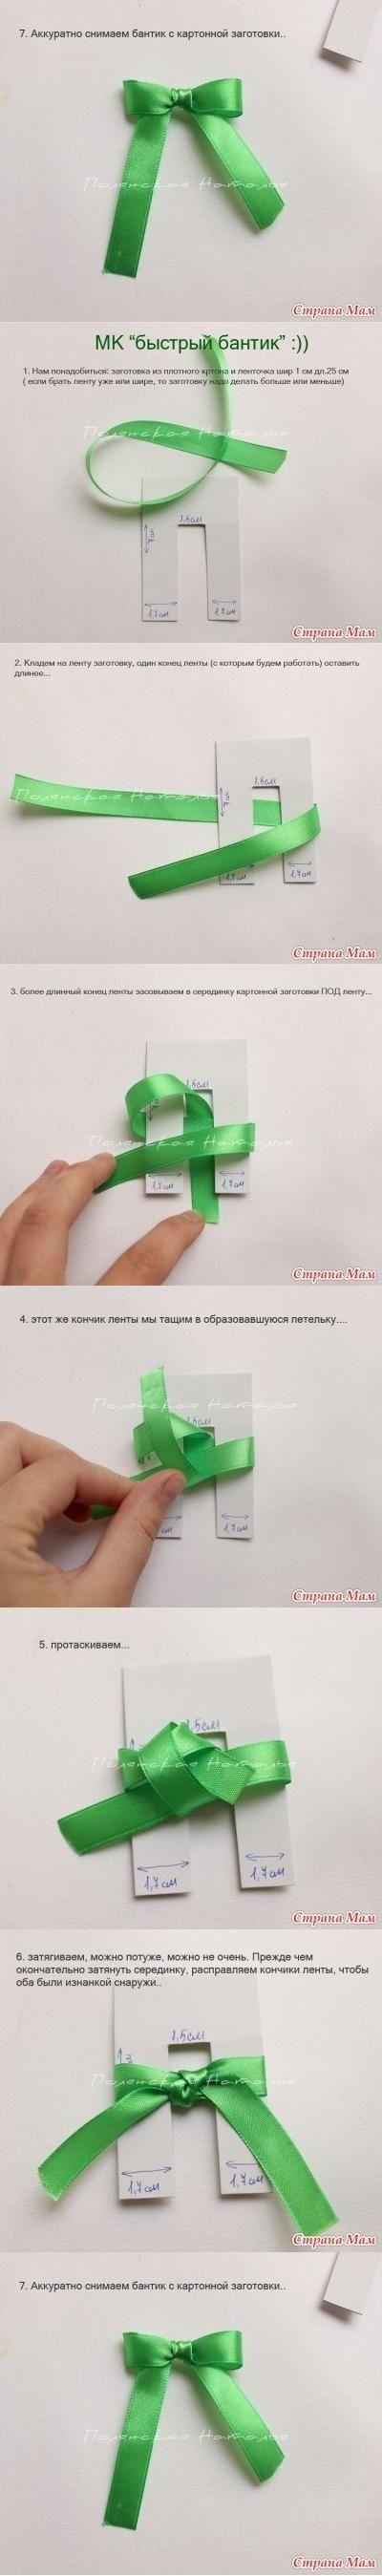 DIY Easy Ribbon Bow DIY Projects / UsefulDIY.com